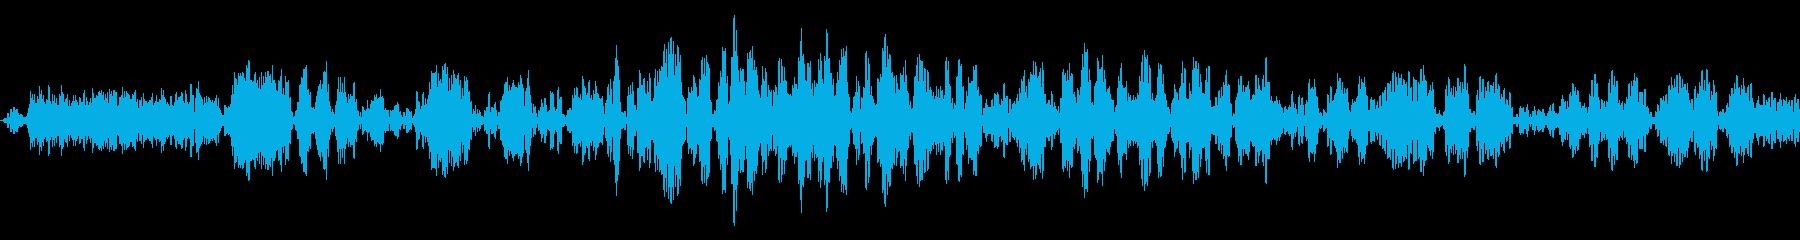 SciFi EC01_89_5の再生済みの波形